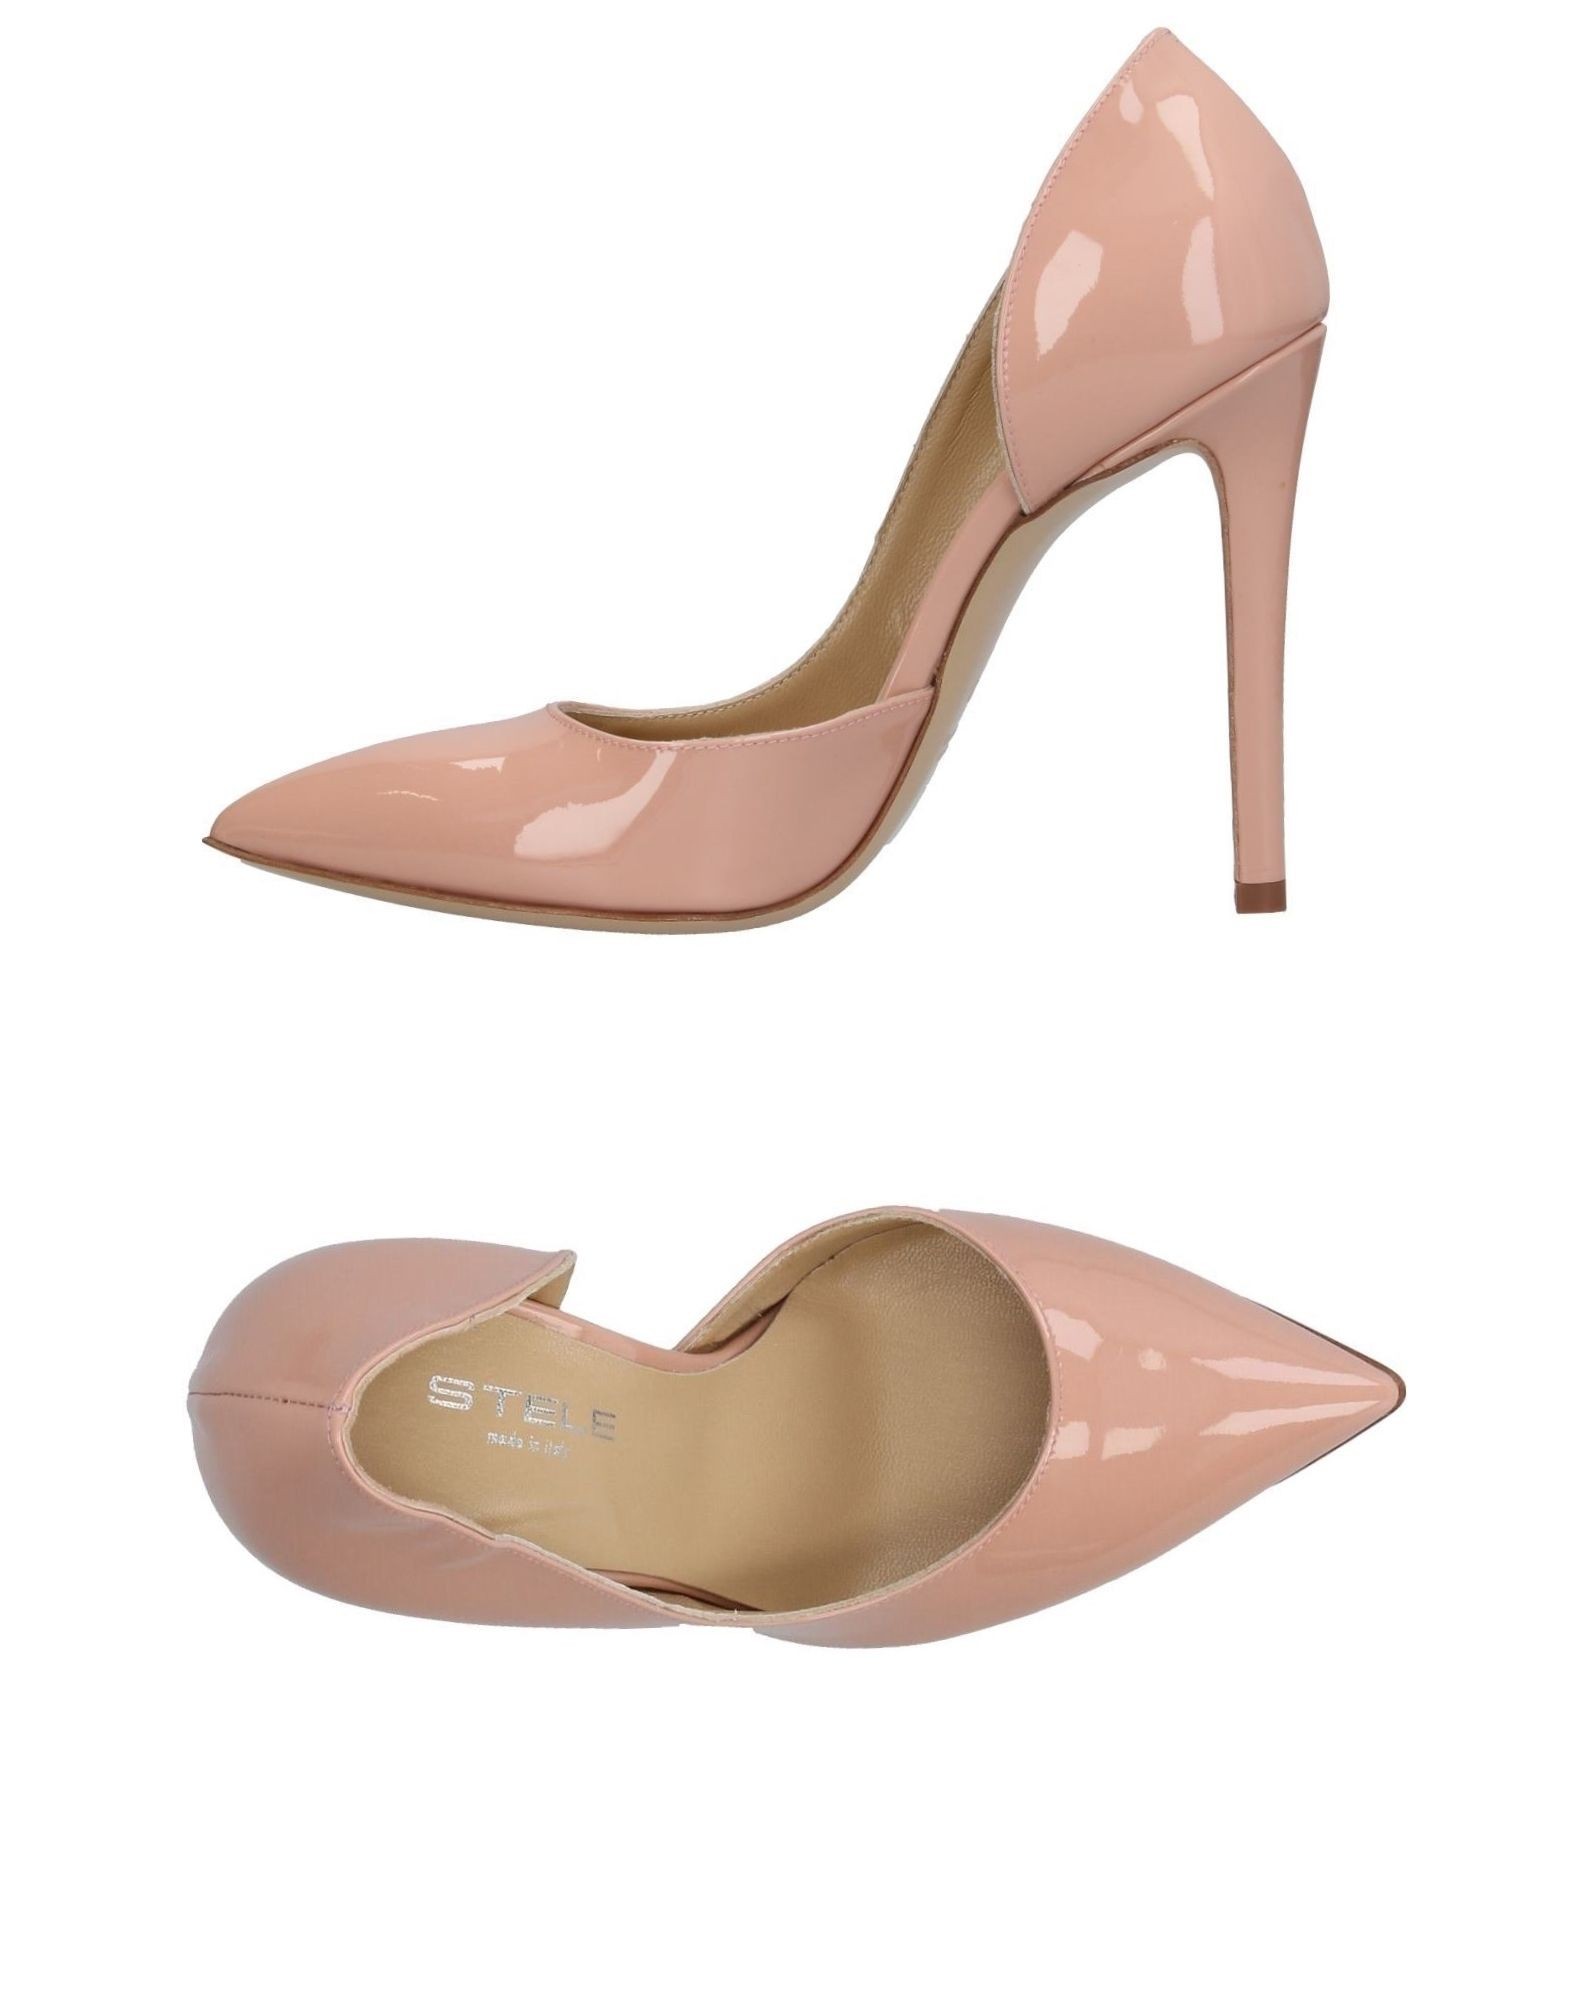 Stele Pumps Damen  11376520BB Gute Qualität beliebte Schuhe